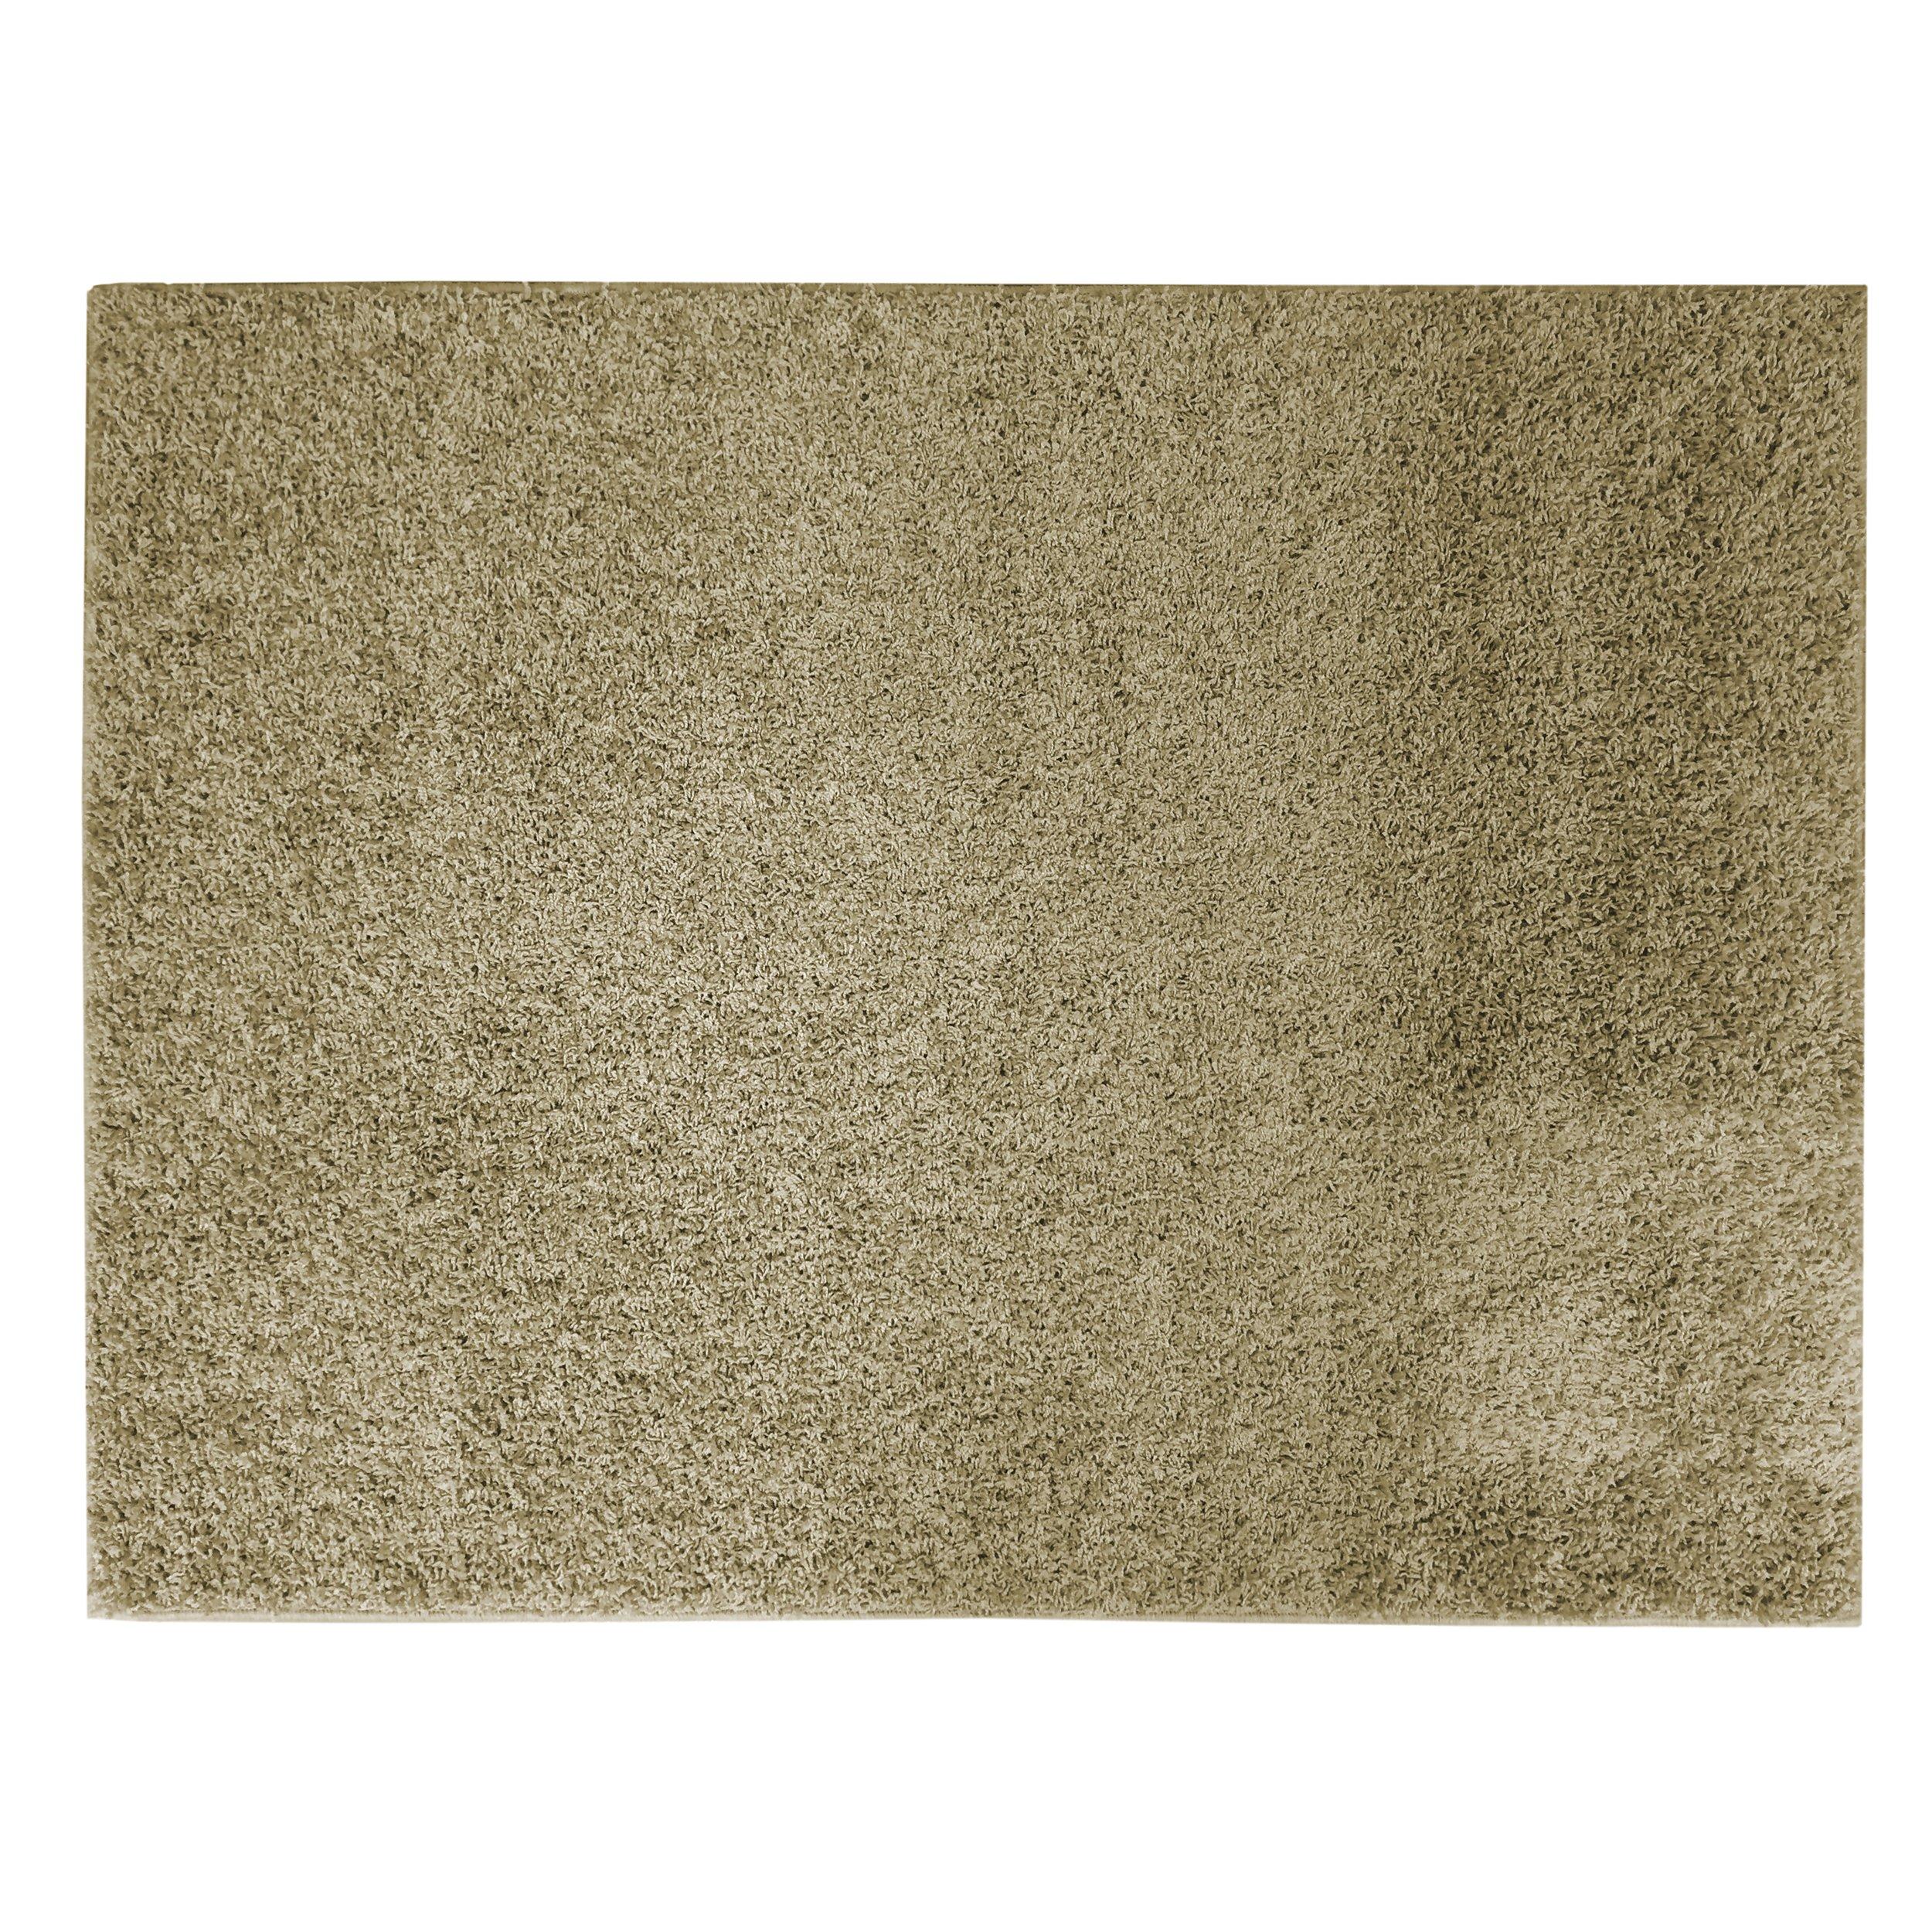 Soft Settings Shag Rug, 7-Feet by 10-Feet, Olive by Apache Mills